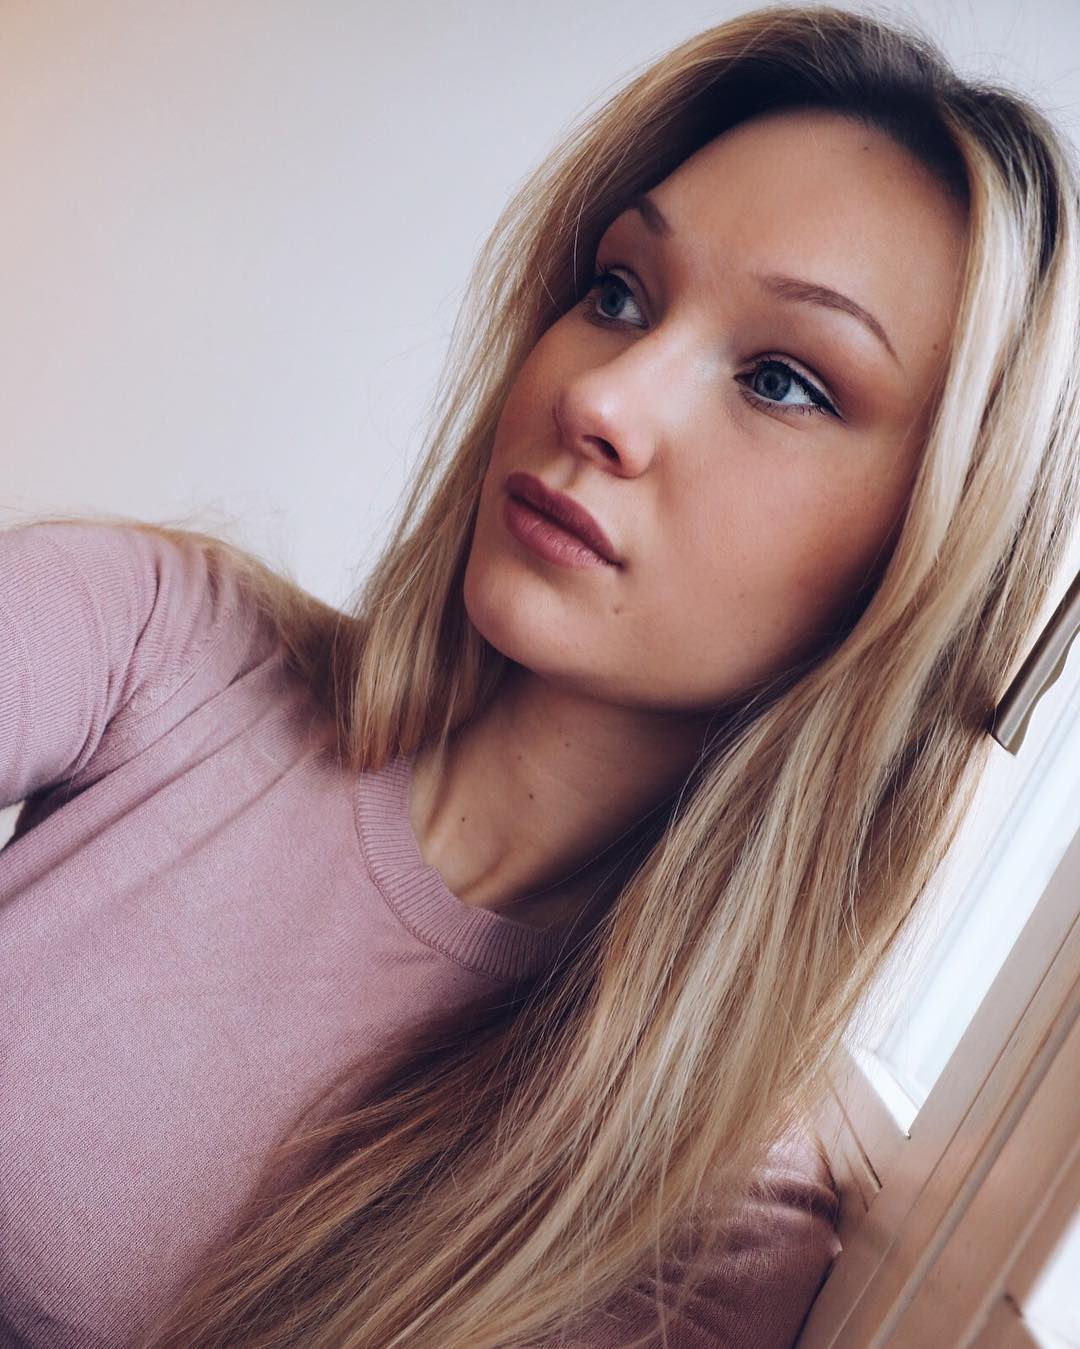 dutchpilotgirl (22)